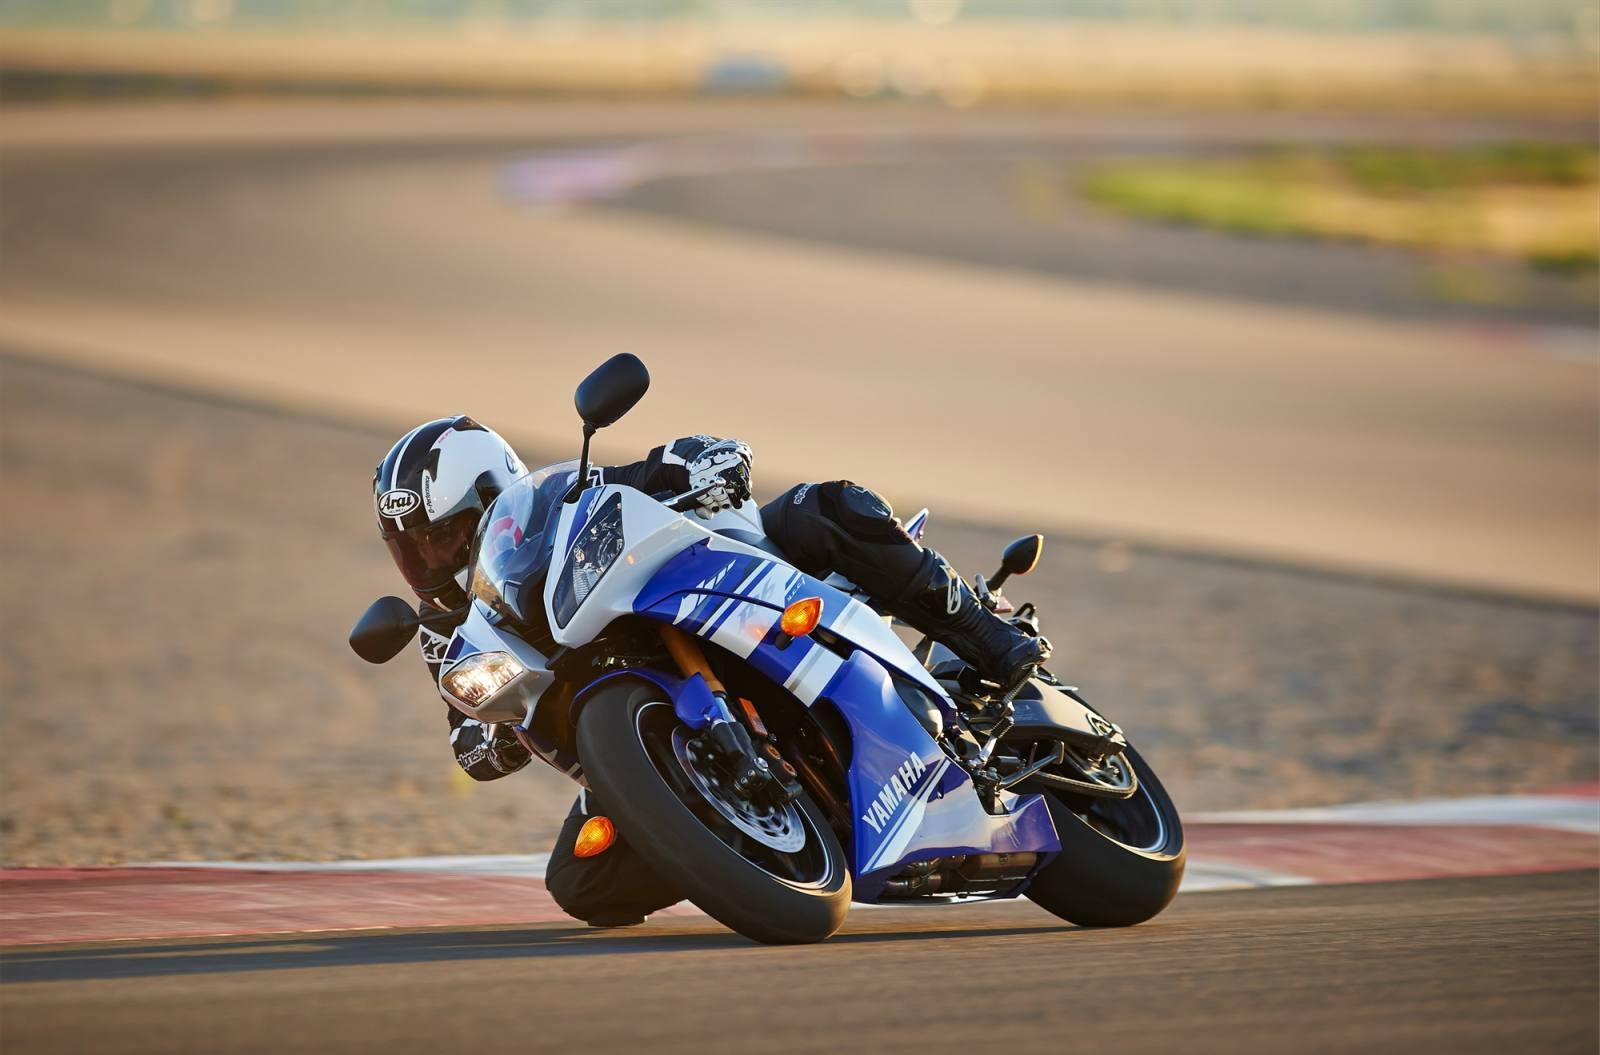 2014 Yamaha YZF-R6 - Team Yamaha Blue/White, Rapid Red/White